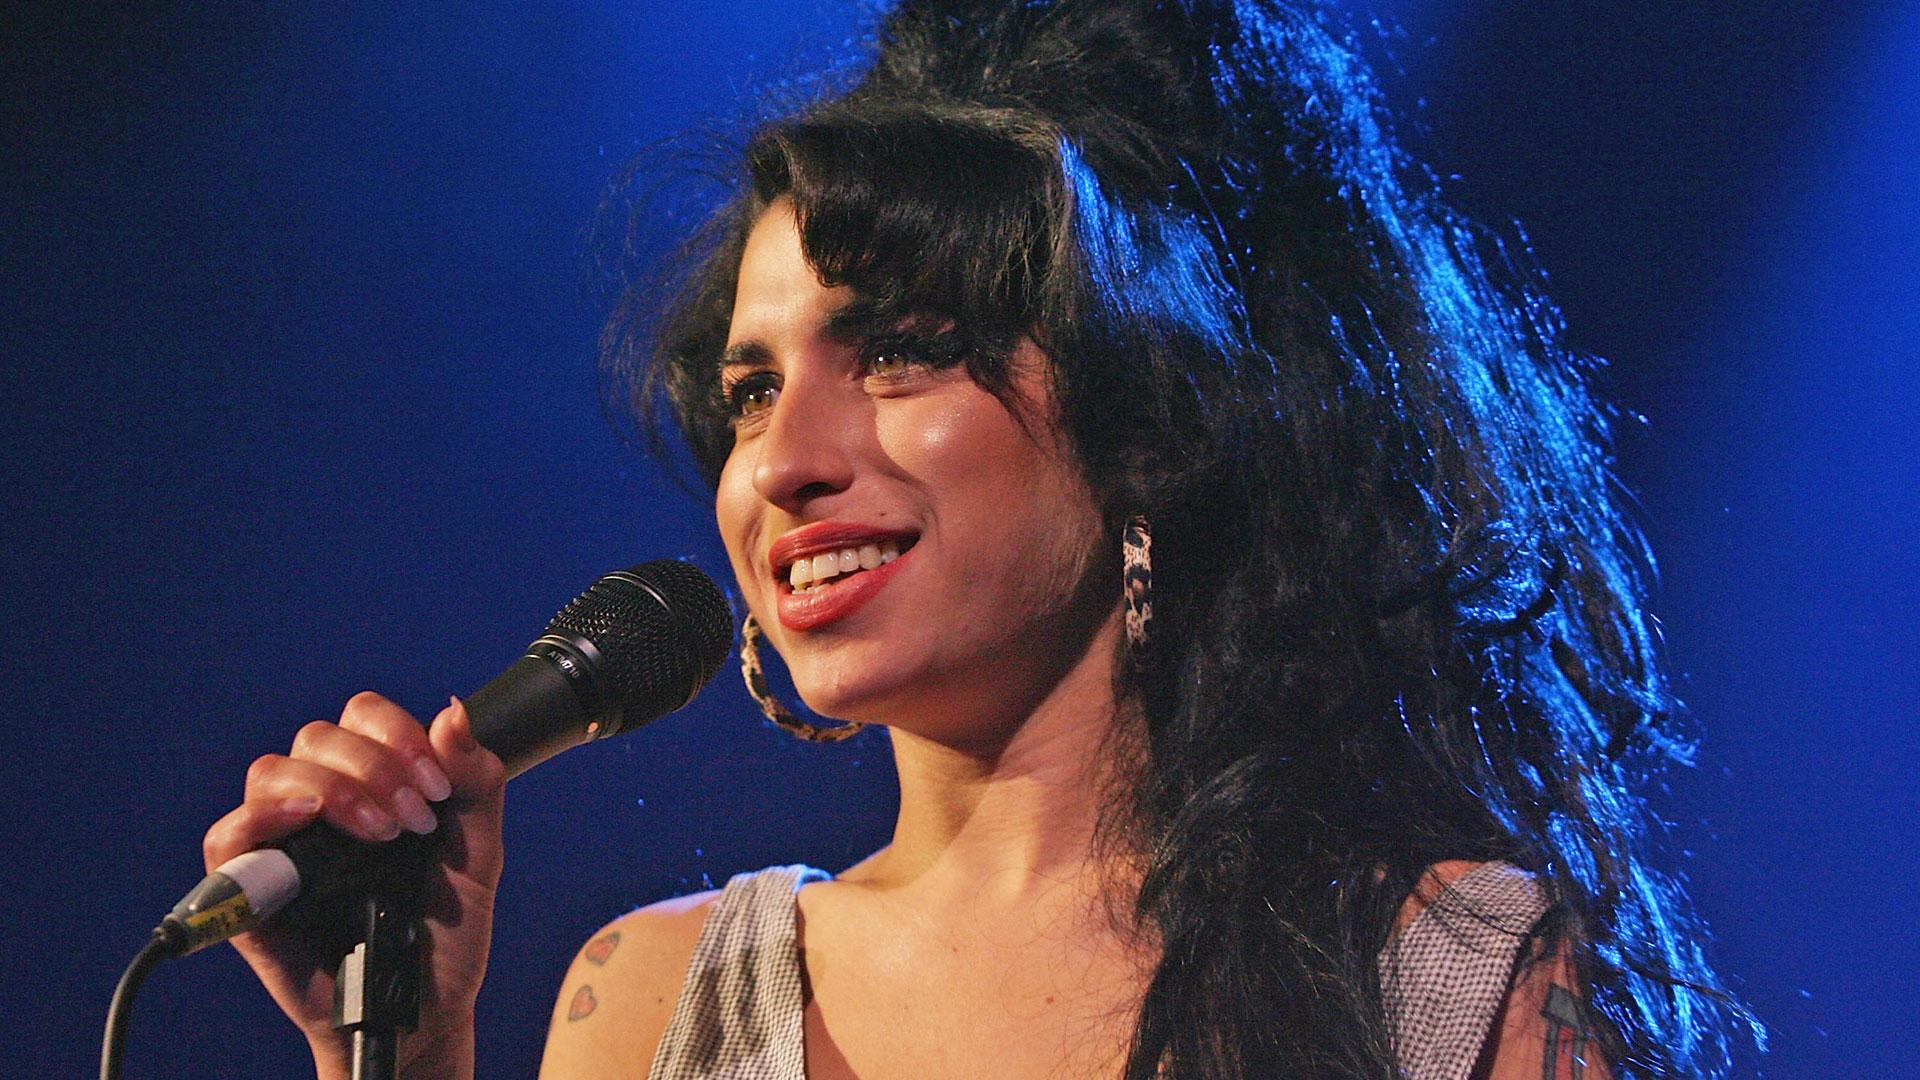 Amy Winehouse: Live at Shepherd's Bush Empire